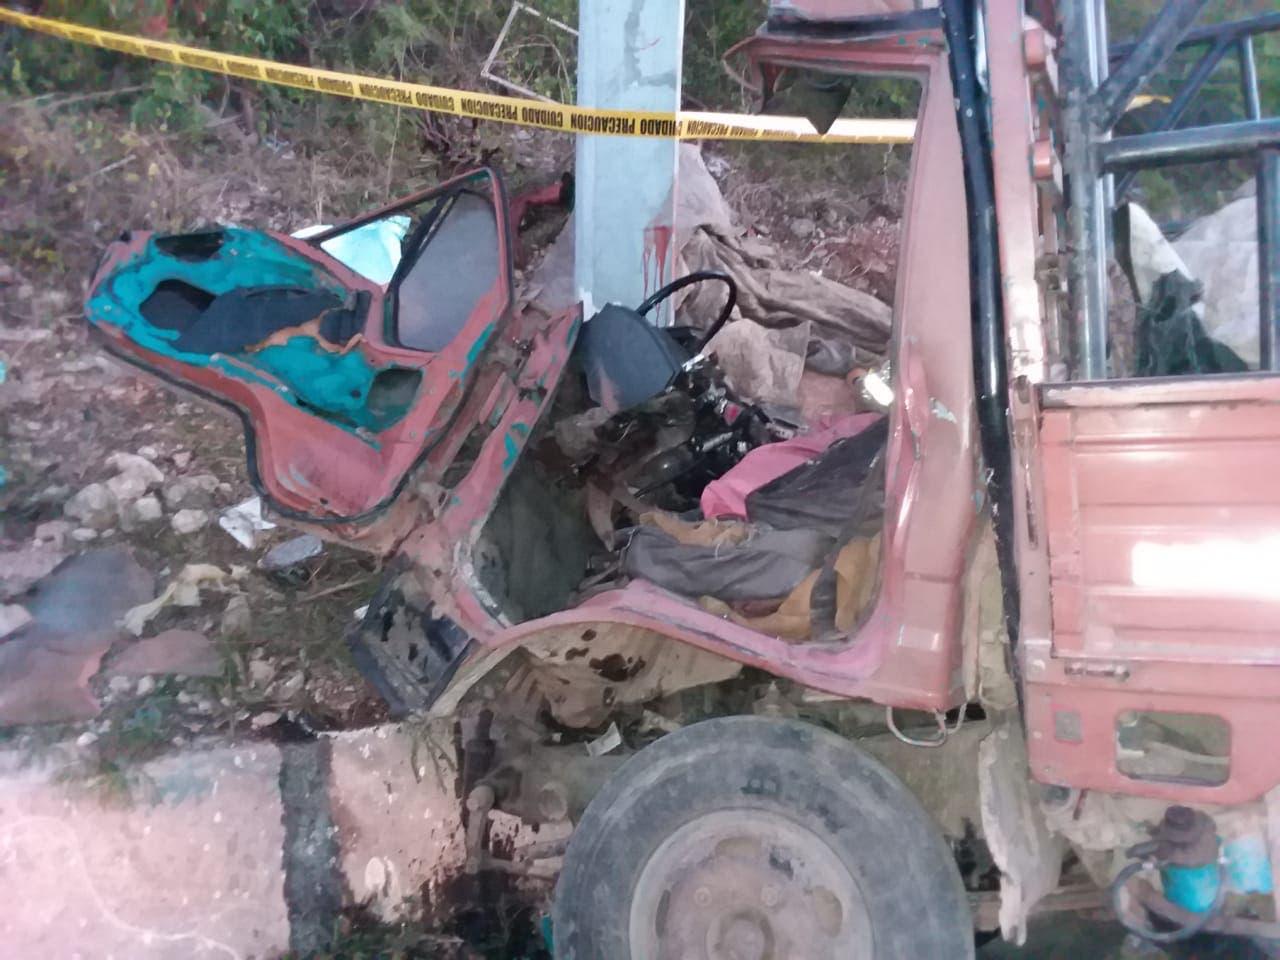 Tres muerto en accidente en la carretera La Romana-San Pedro